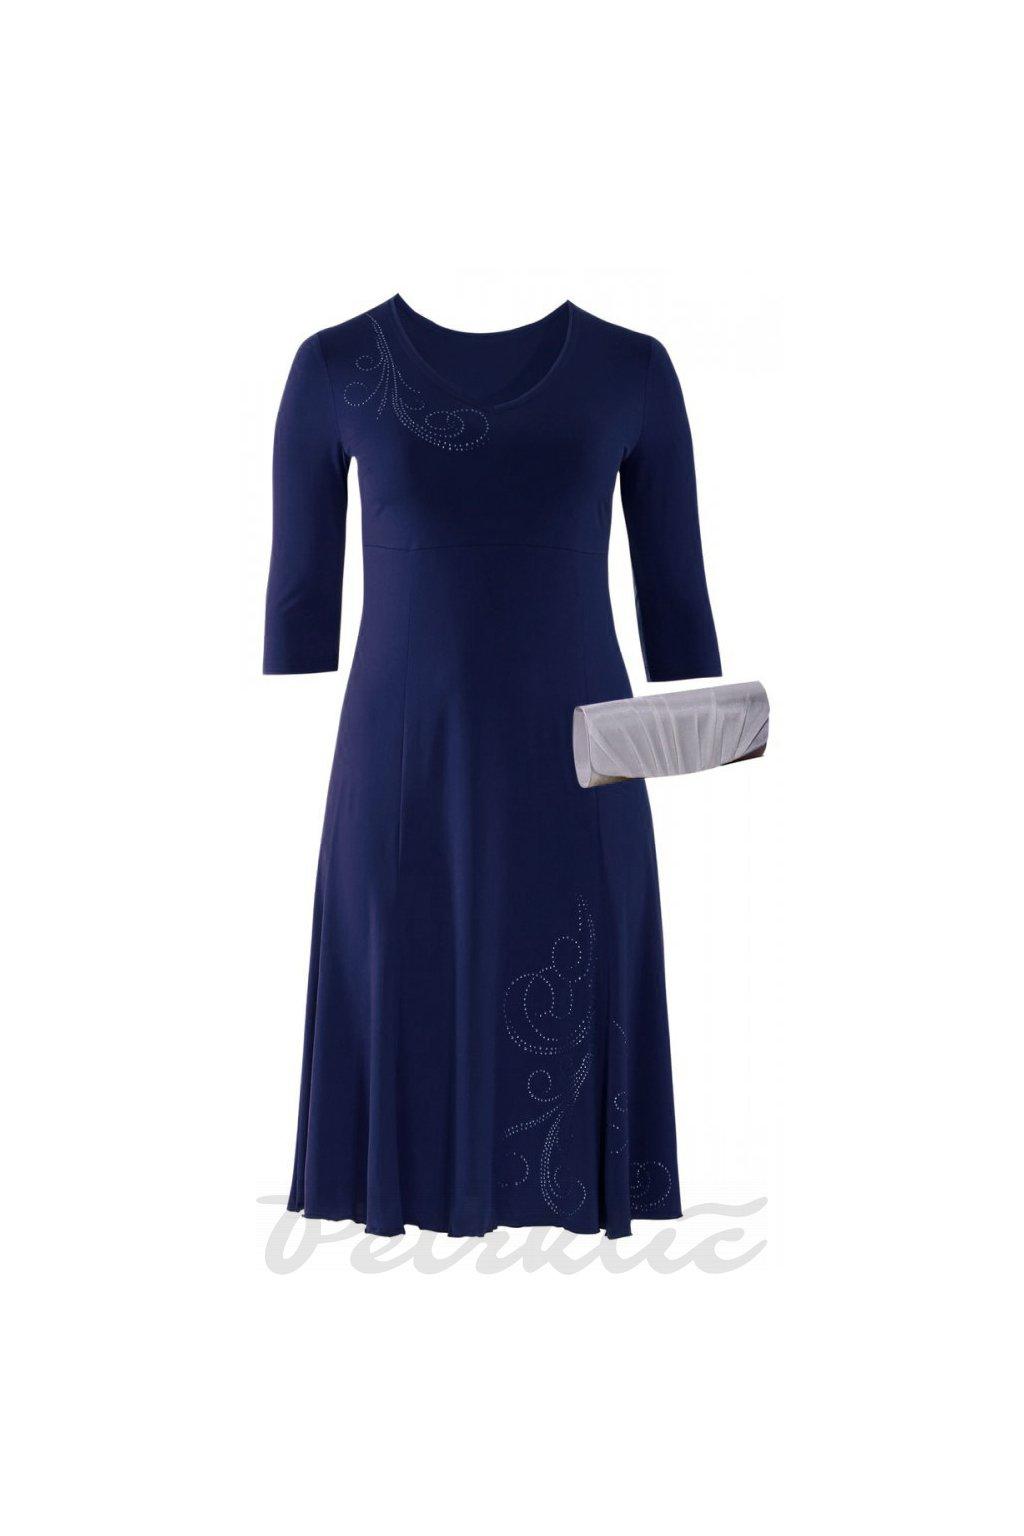 AGNES šaty 130 - 135 cm